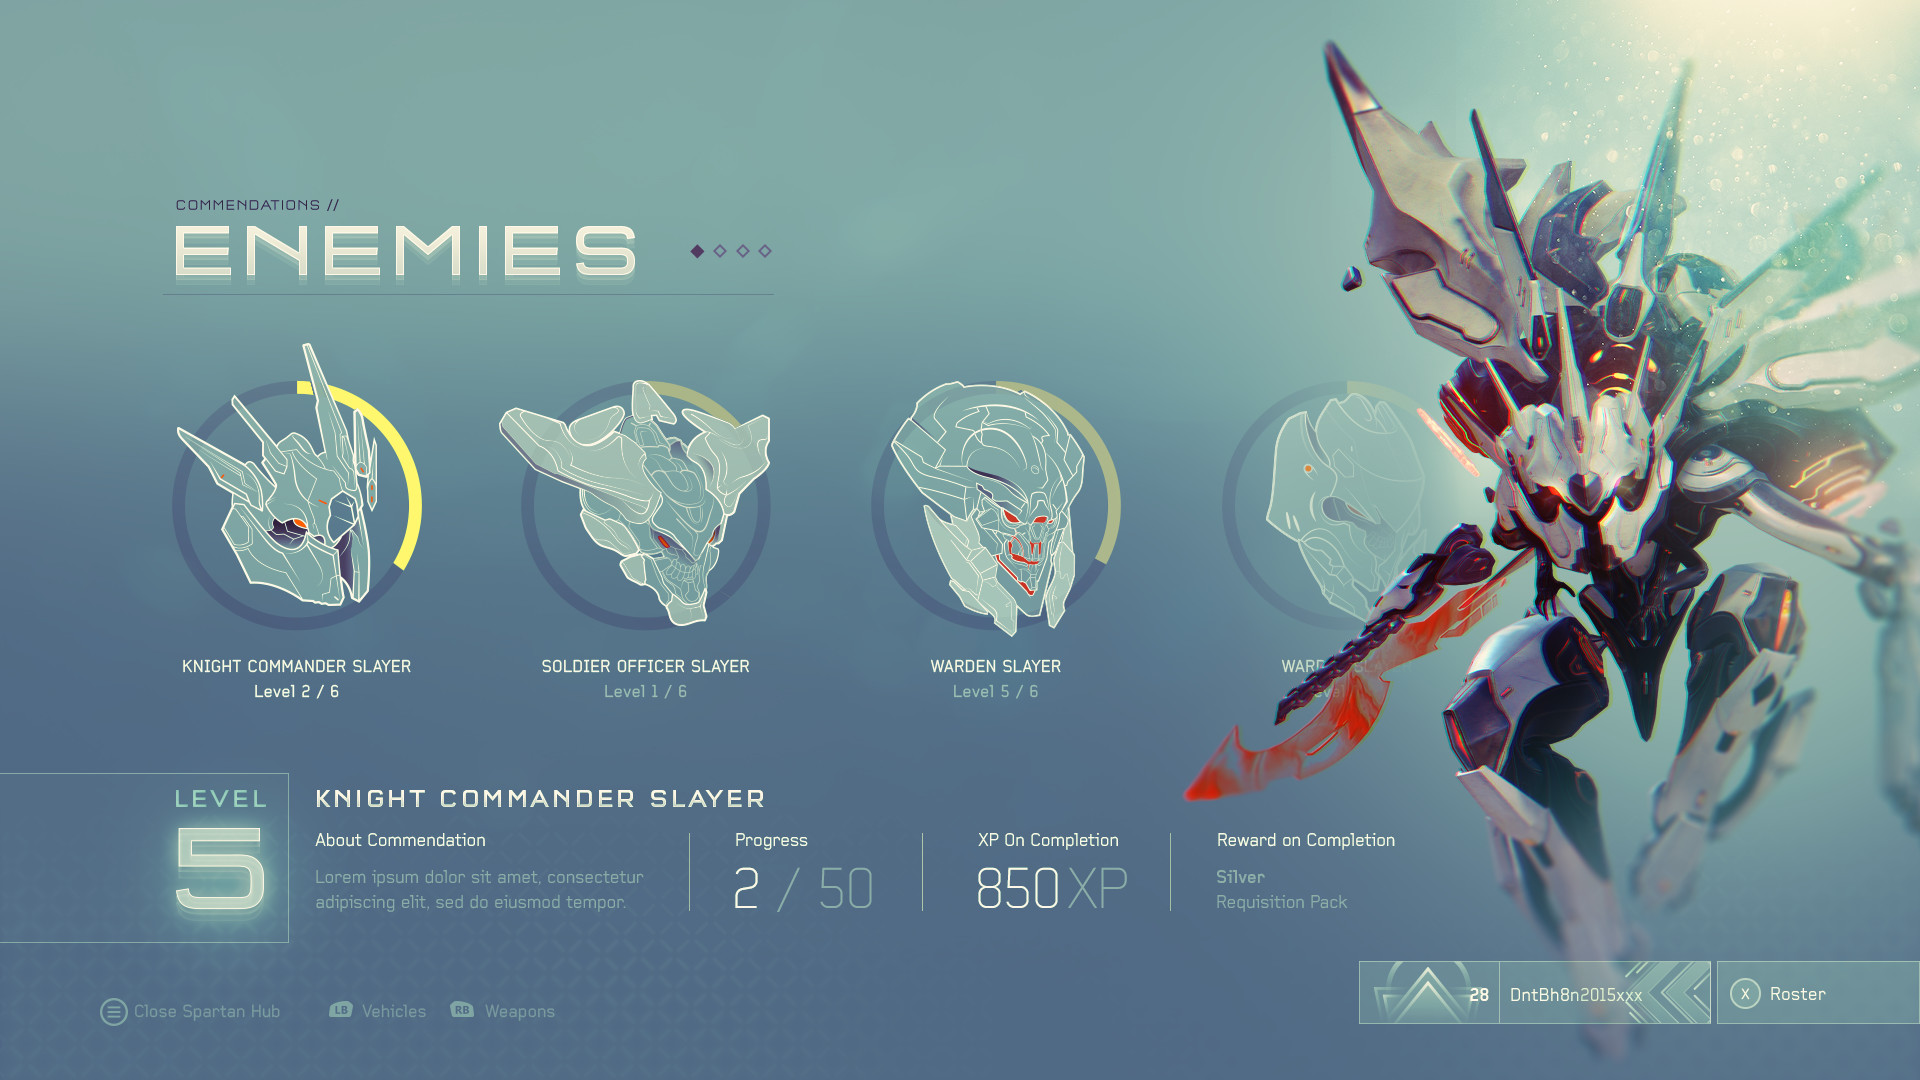 ramiro-galan-spartan-hub-commendations-4